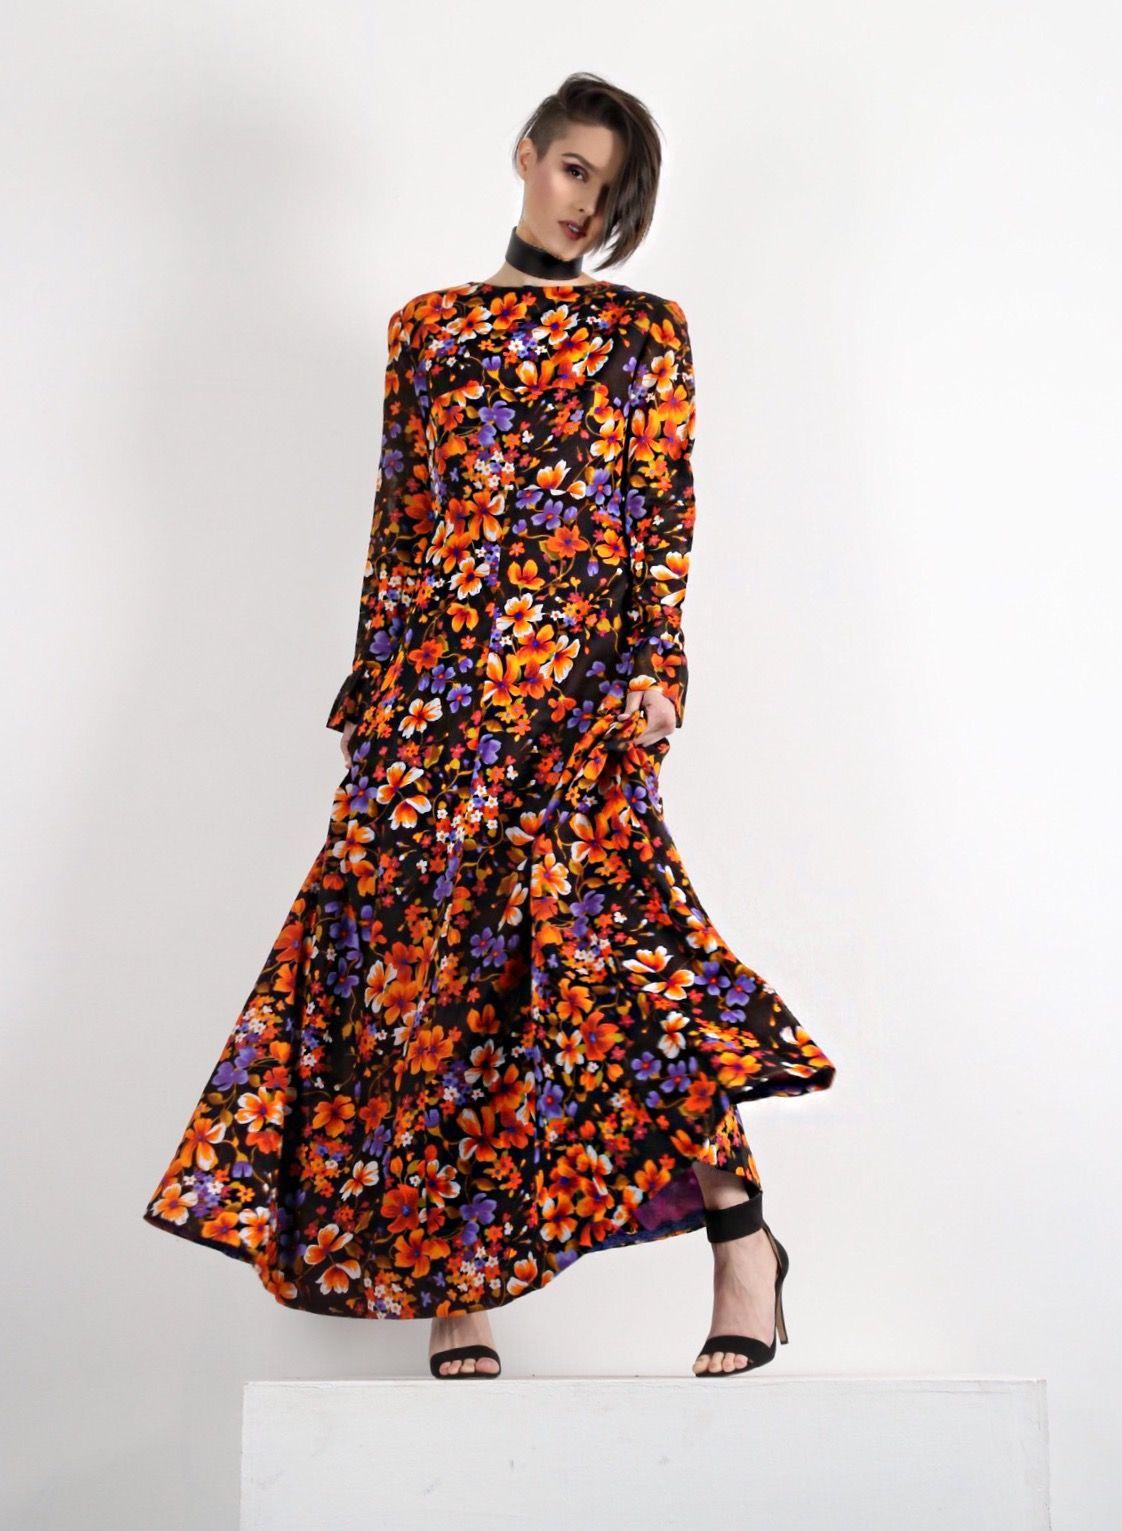 03f2ee0992e Petite maxi dress - fit and flare dress - Stevie Nicks - Stevie Nicks Dress  - flowy dress - floral dress - shop vintage clothing - 70s dress - 60s dress  ...